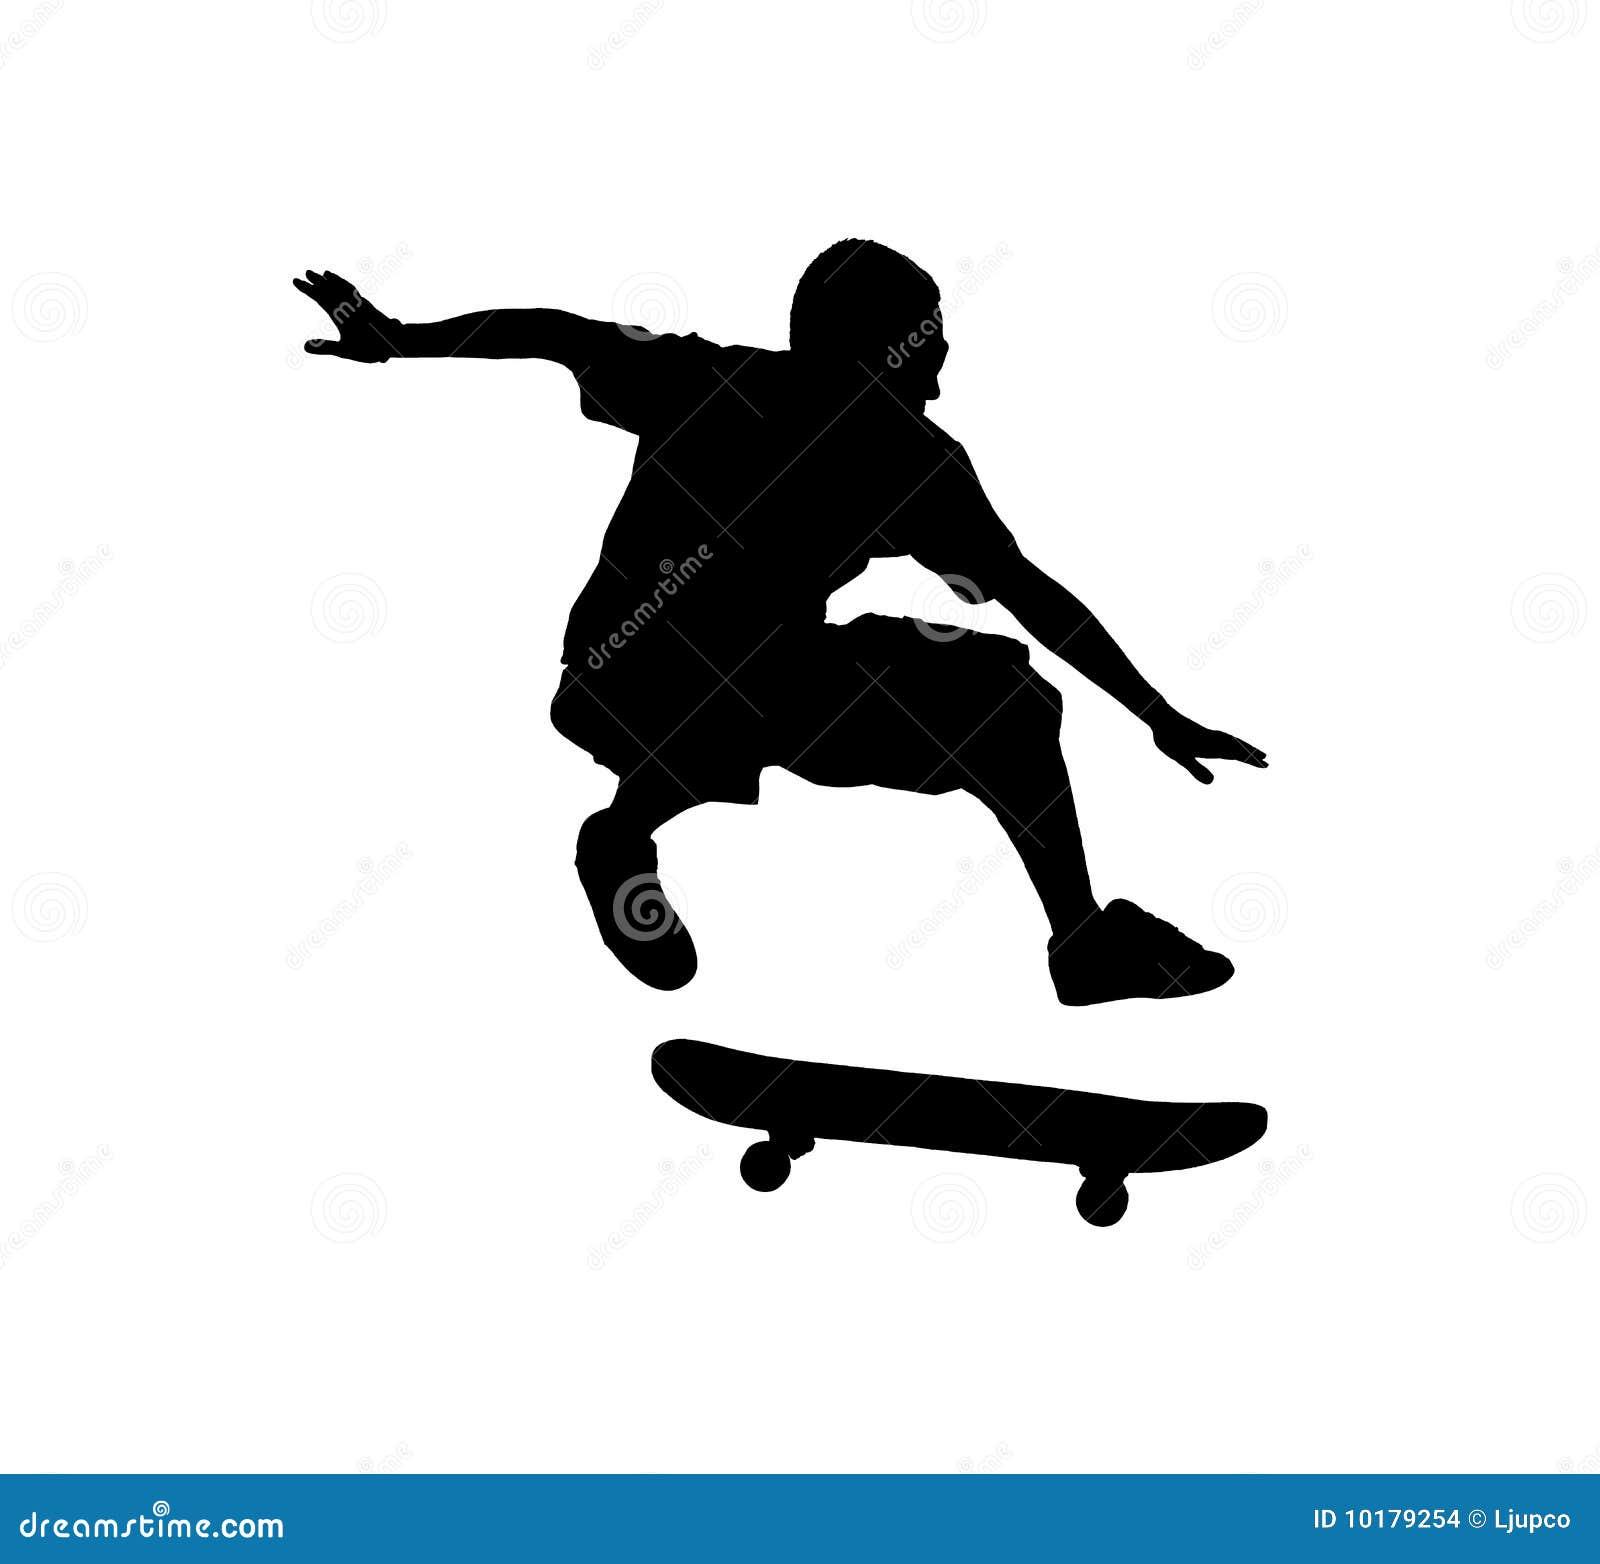 Silhouette of a skateboarder Skateboarder Silhouette Clip Art